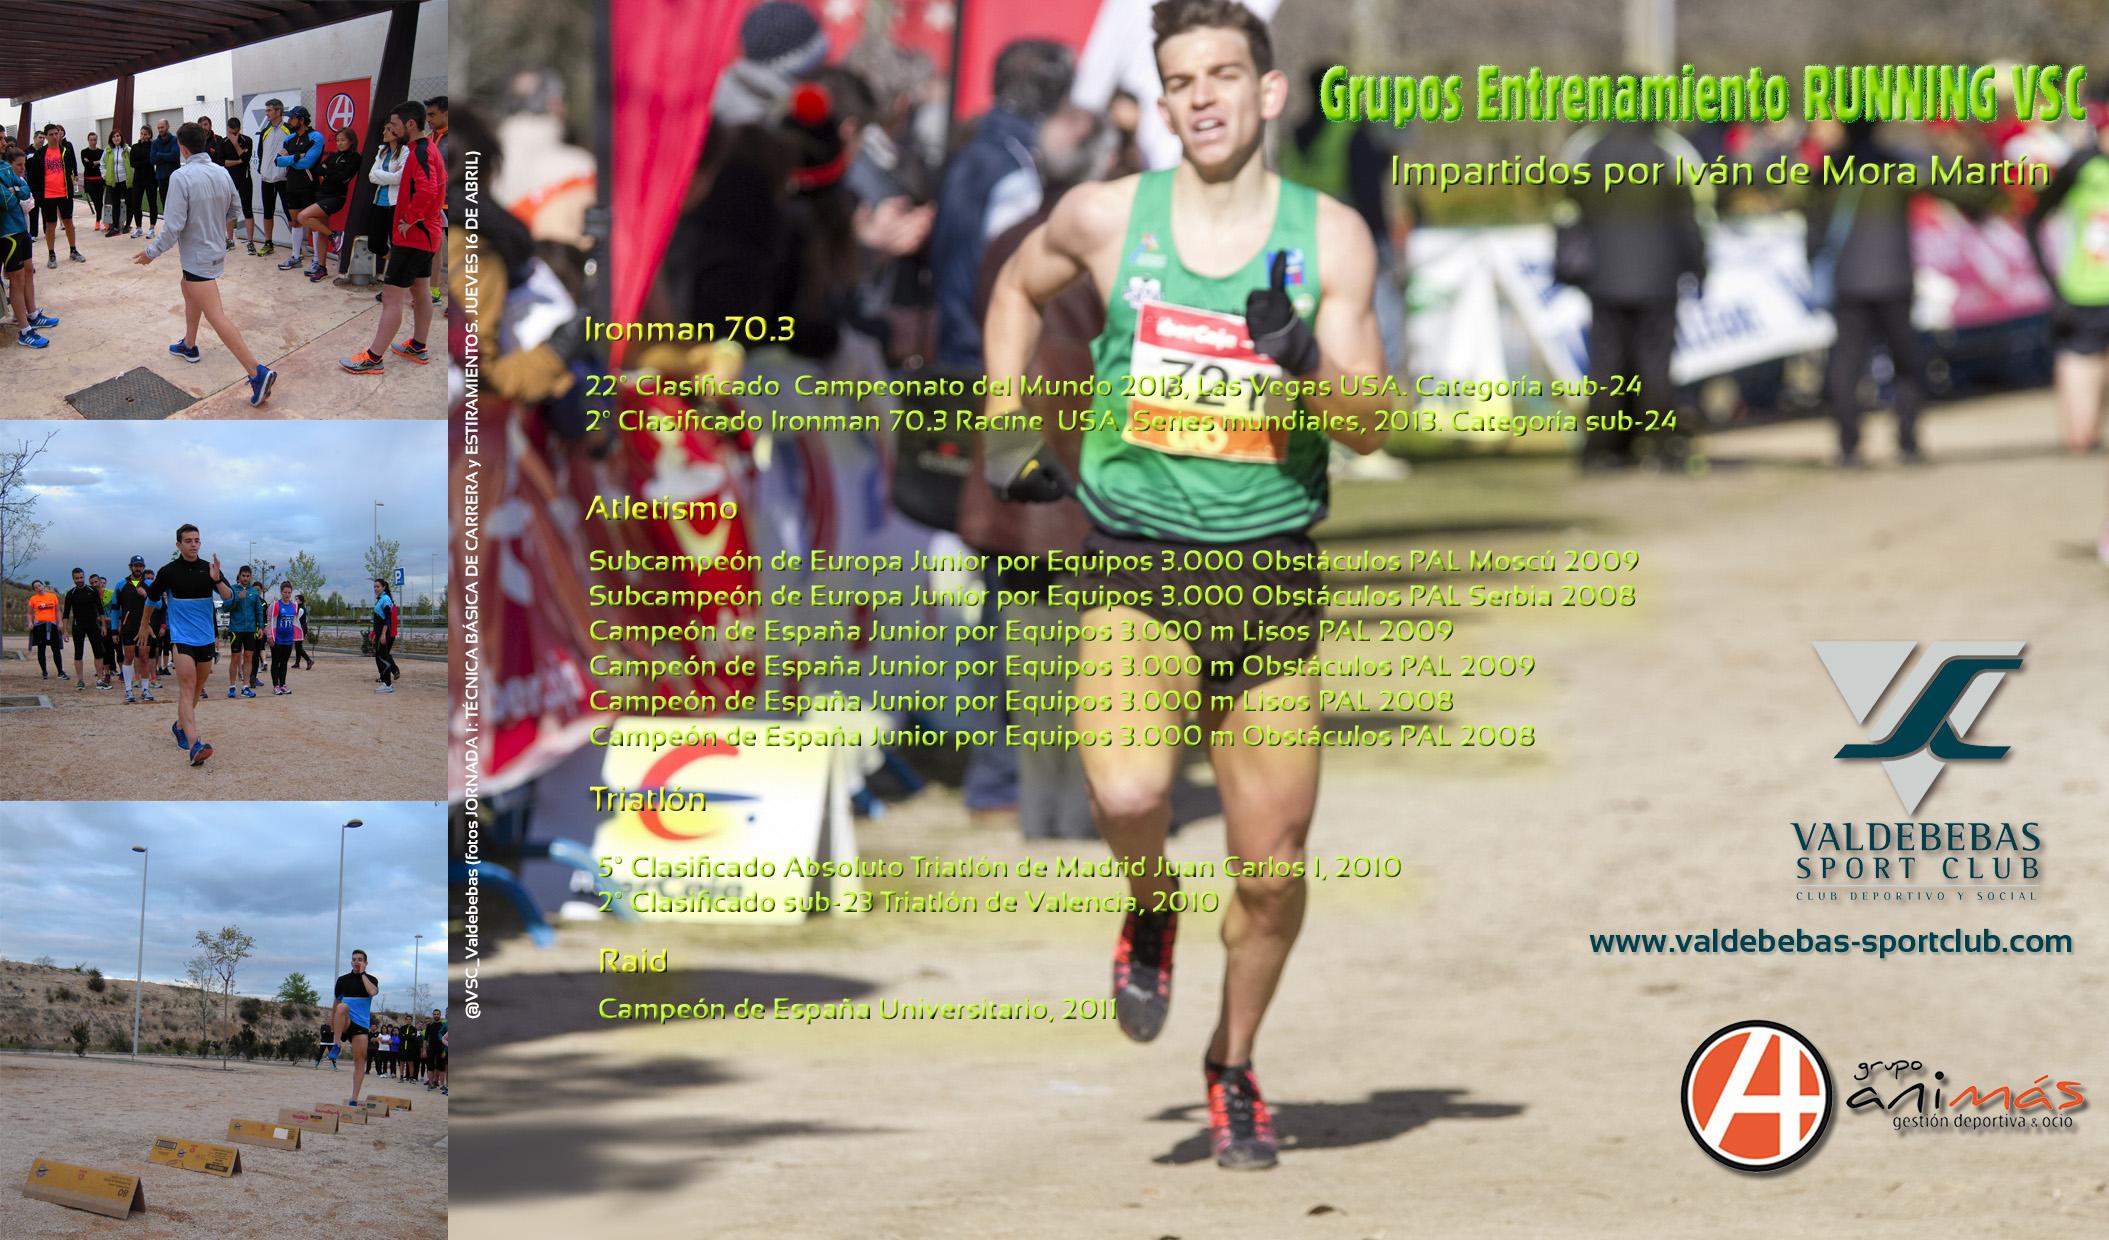 Grupos RUNNING VSC Iván de Mora